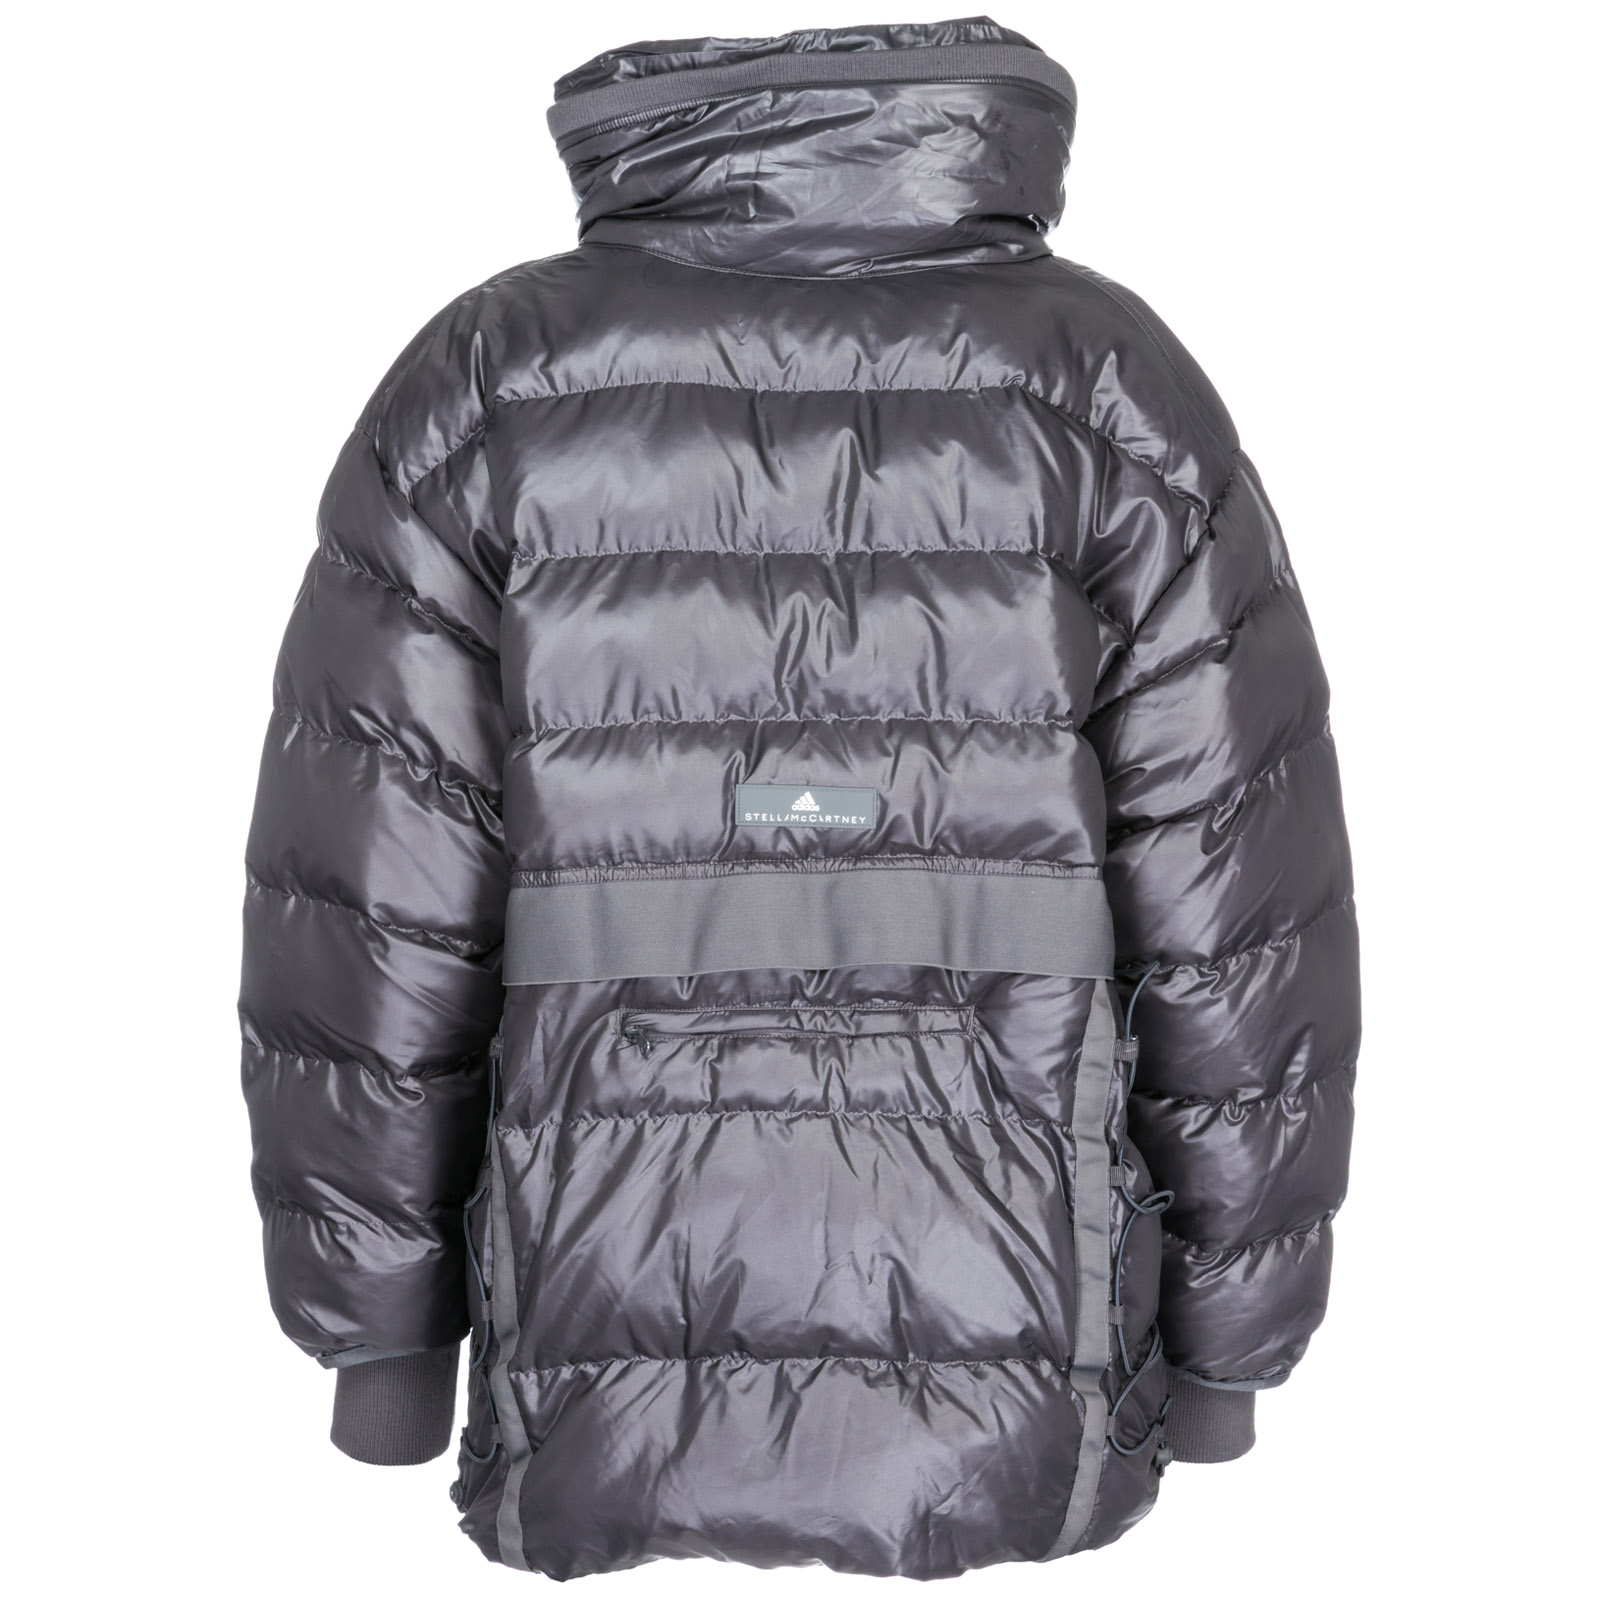 9c77e5394 Women's outerwear down jacket blouson hood Women's outerwear down jacket  blouson hood